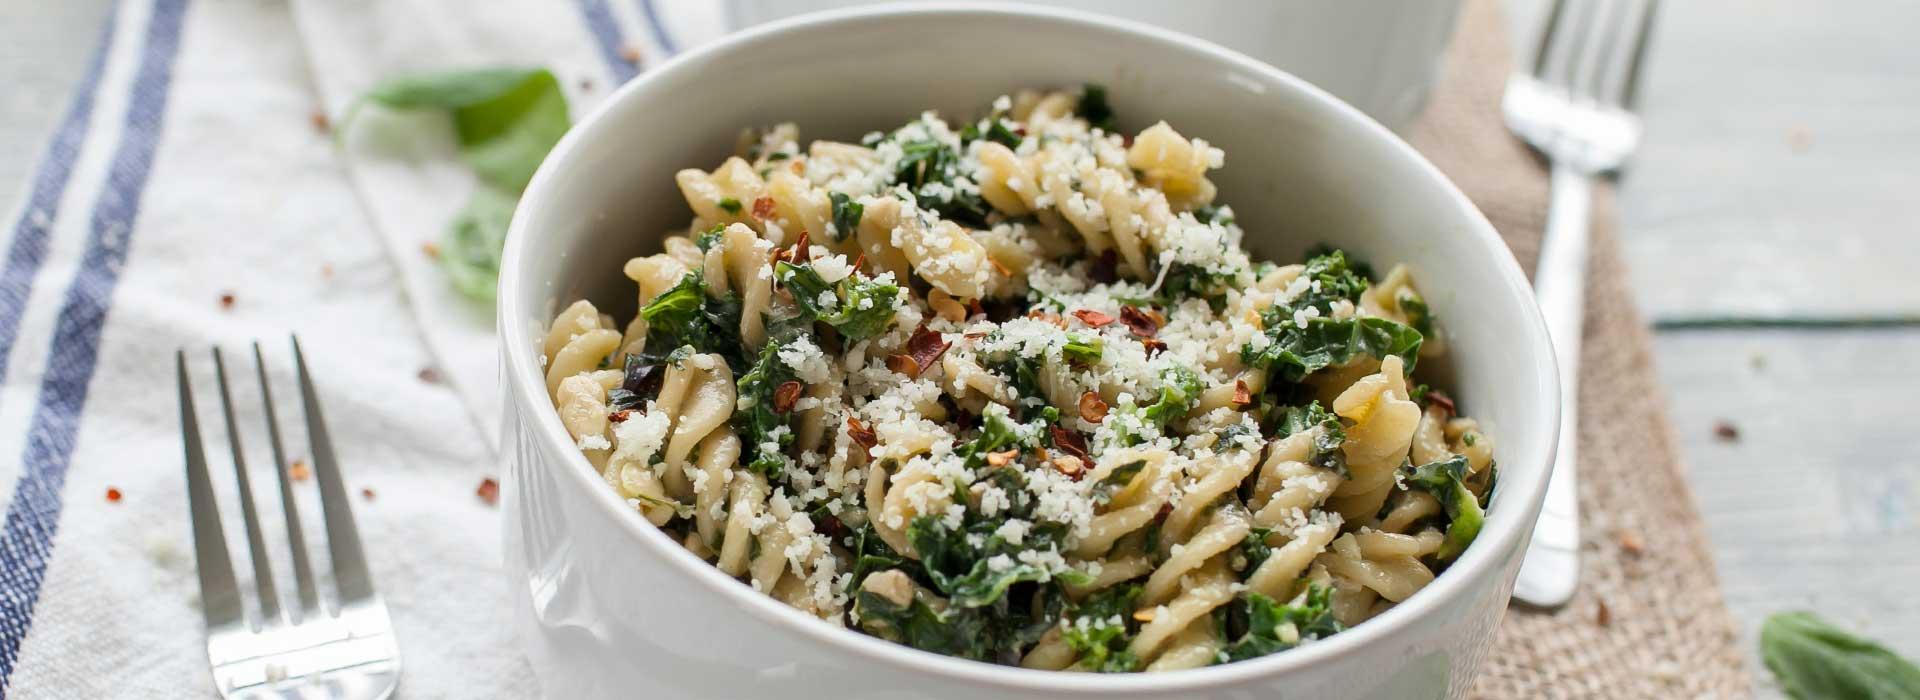 30-Minute Creamy Pesto Pasta